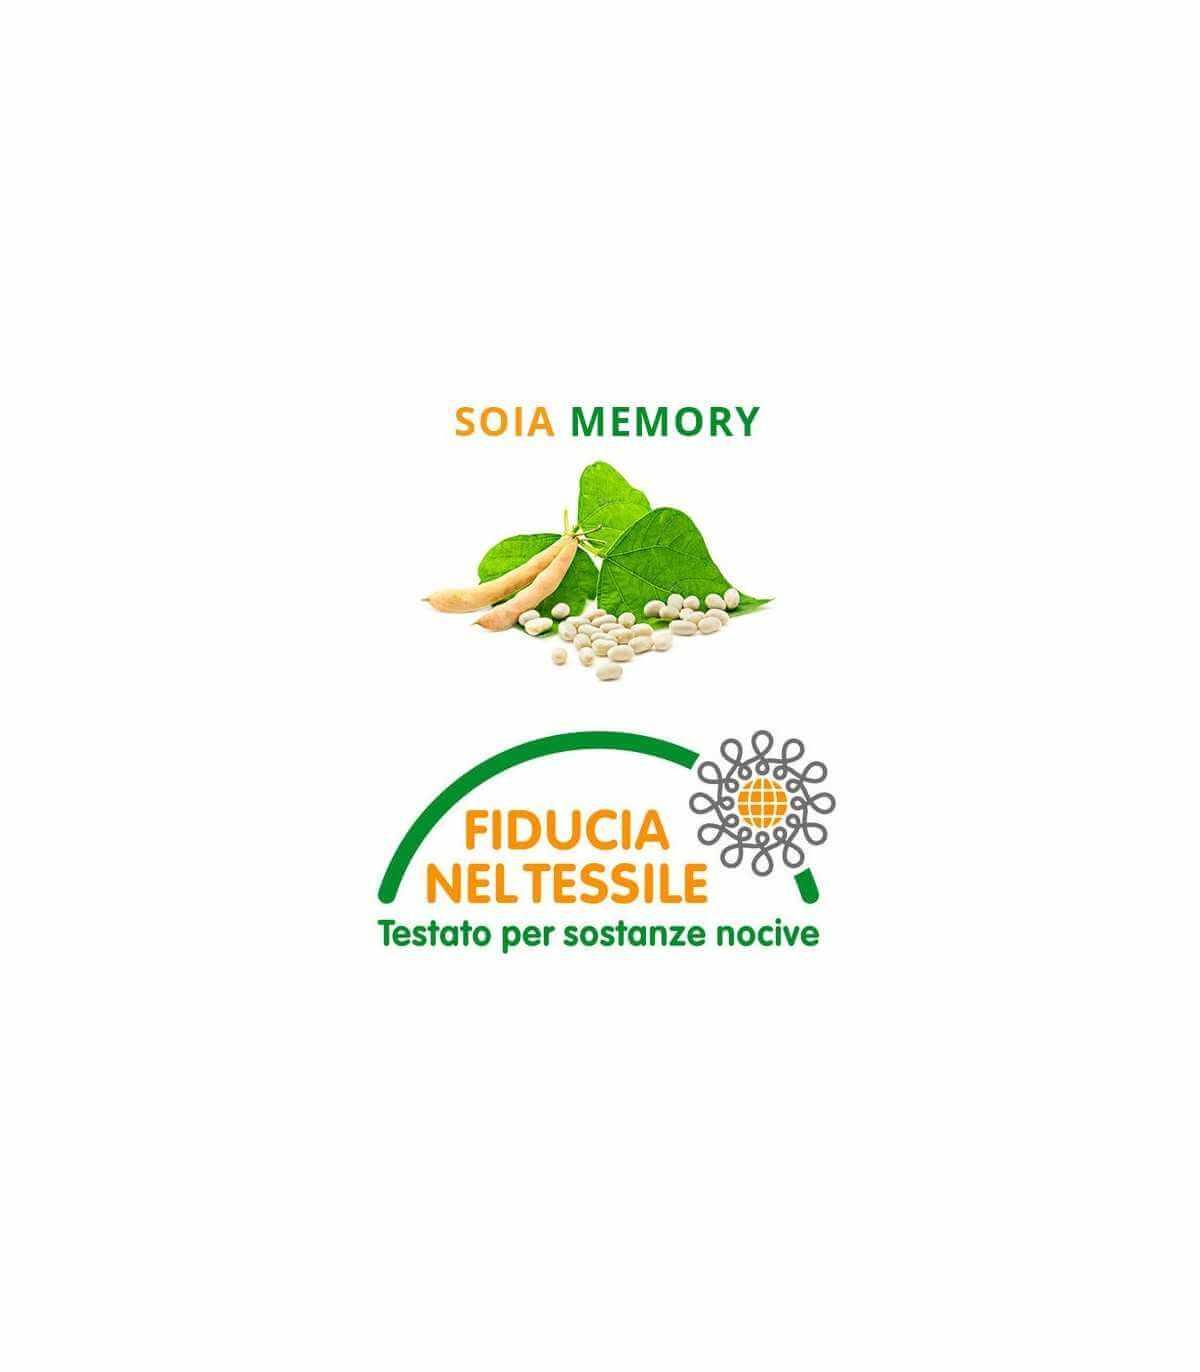 Misure Materasso Standard Matrimoniale.Mattress In Soia Memory With Different Comfort Zones H25